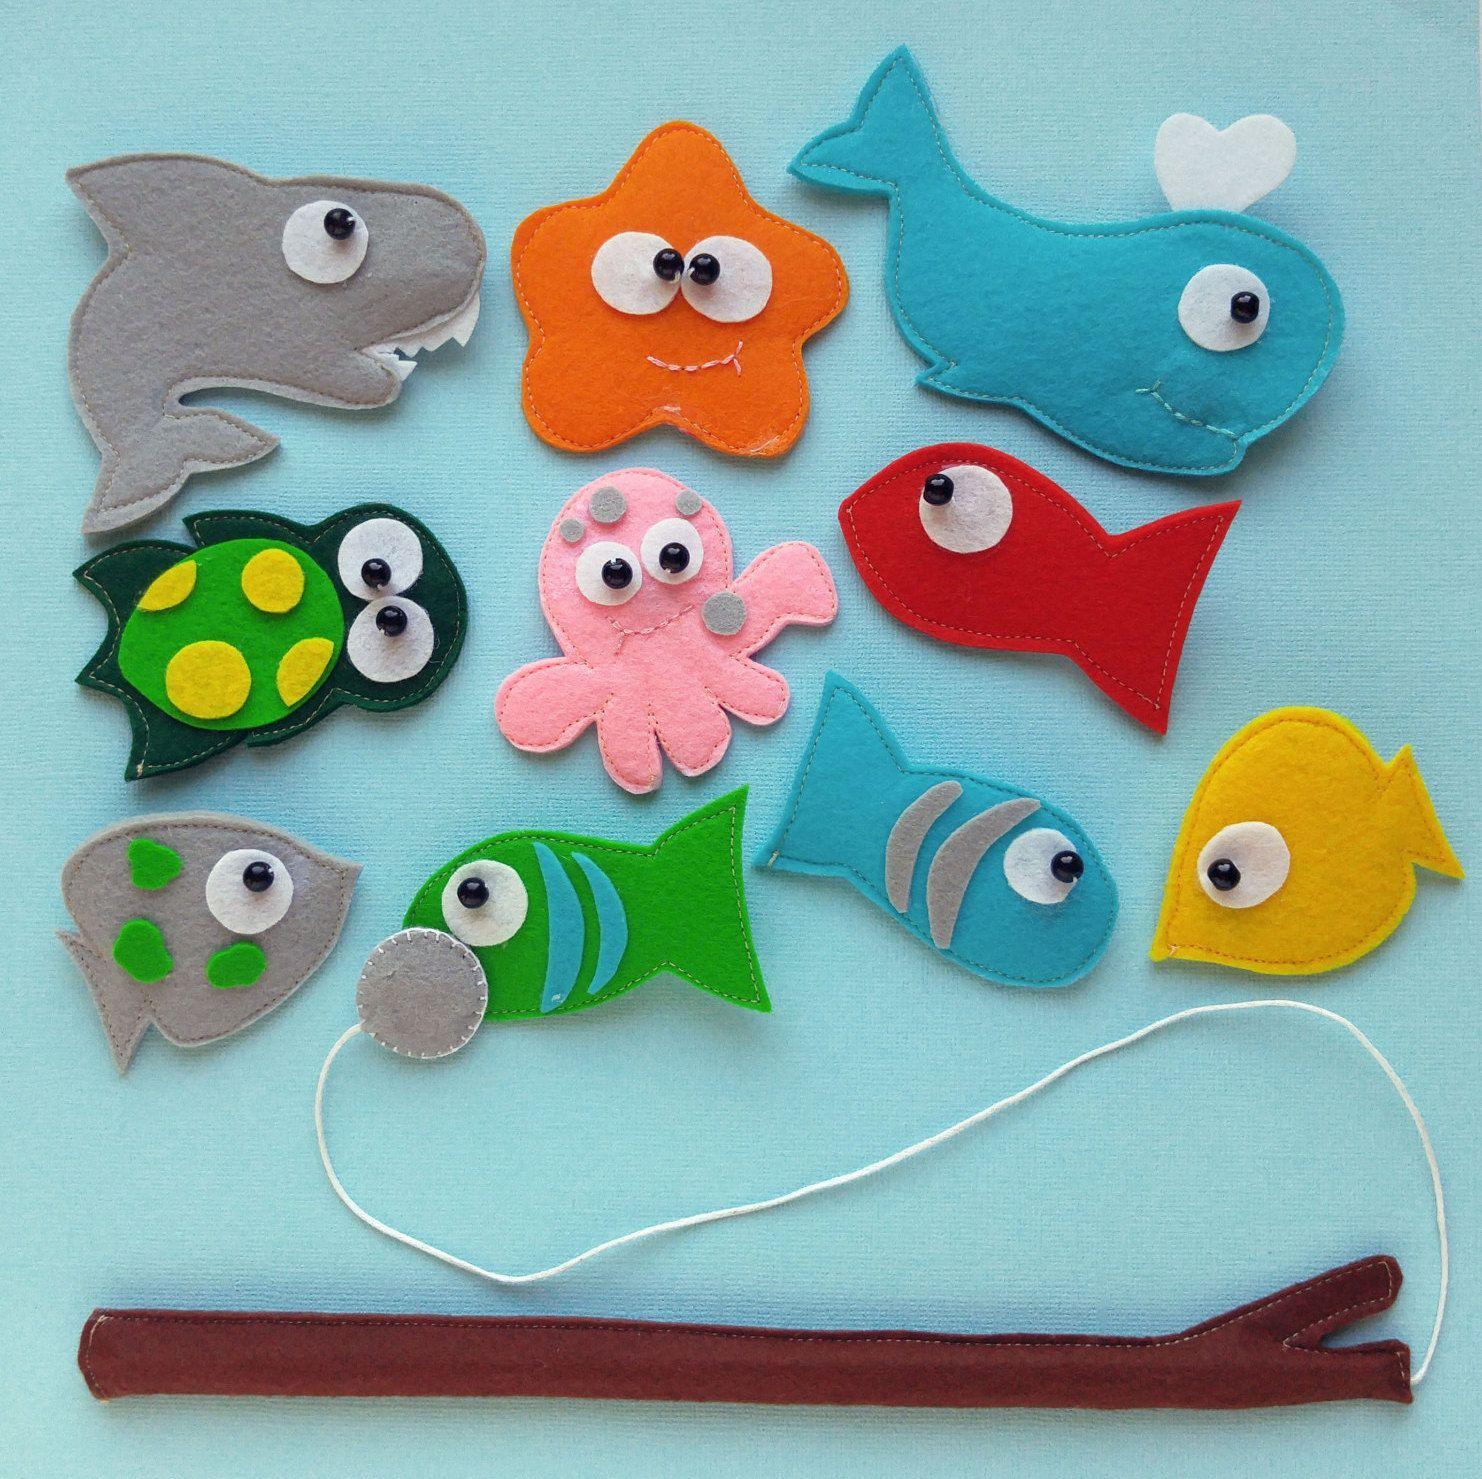 Felt Magnetic Fishing Game Kids Magnet Fishing Set Eco friendly